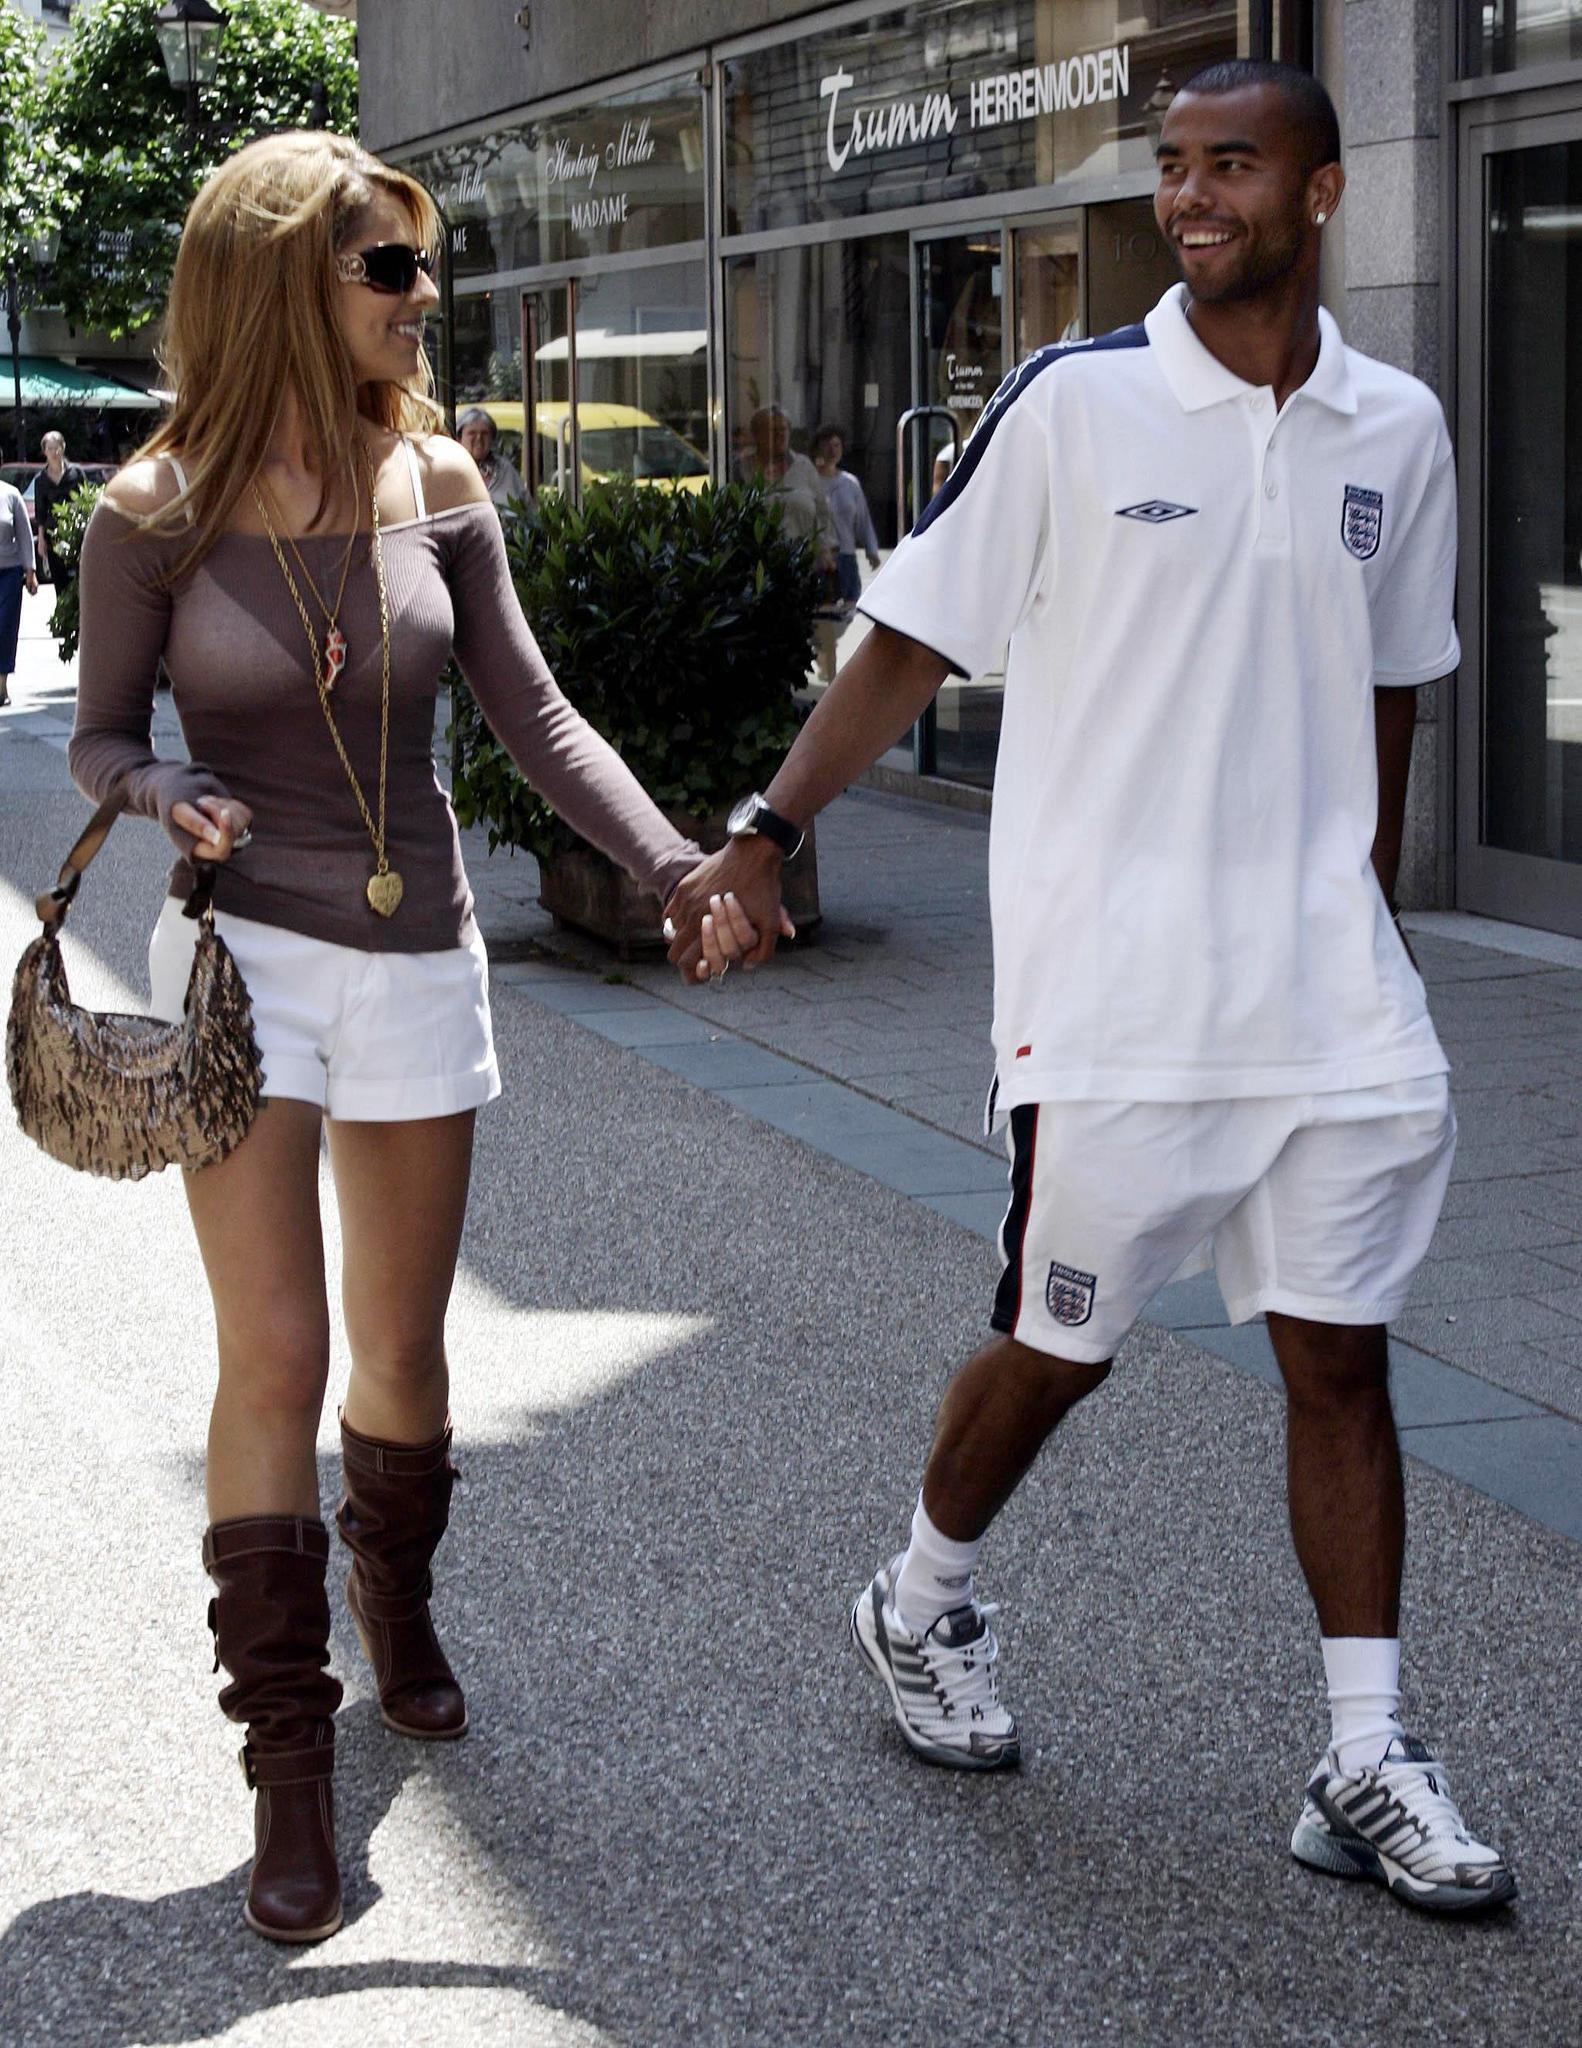 England footballer Ashley Cole with partner Cheryl Tweedy in the centre of Baden-Baden, Germany,